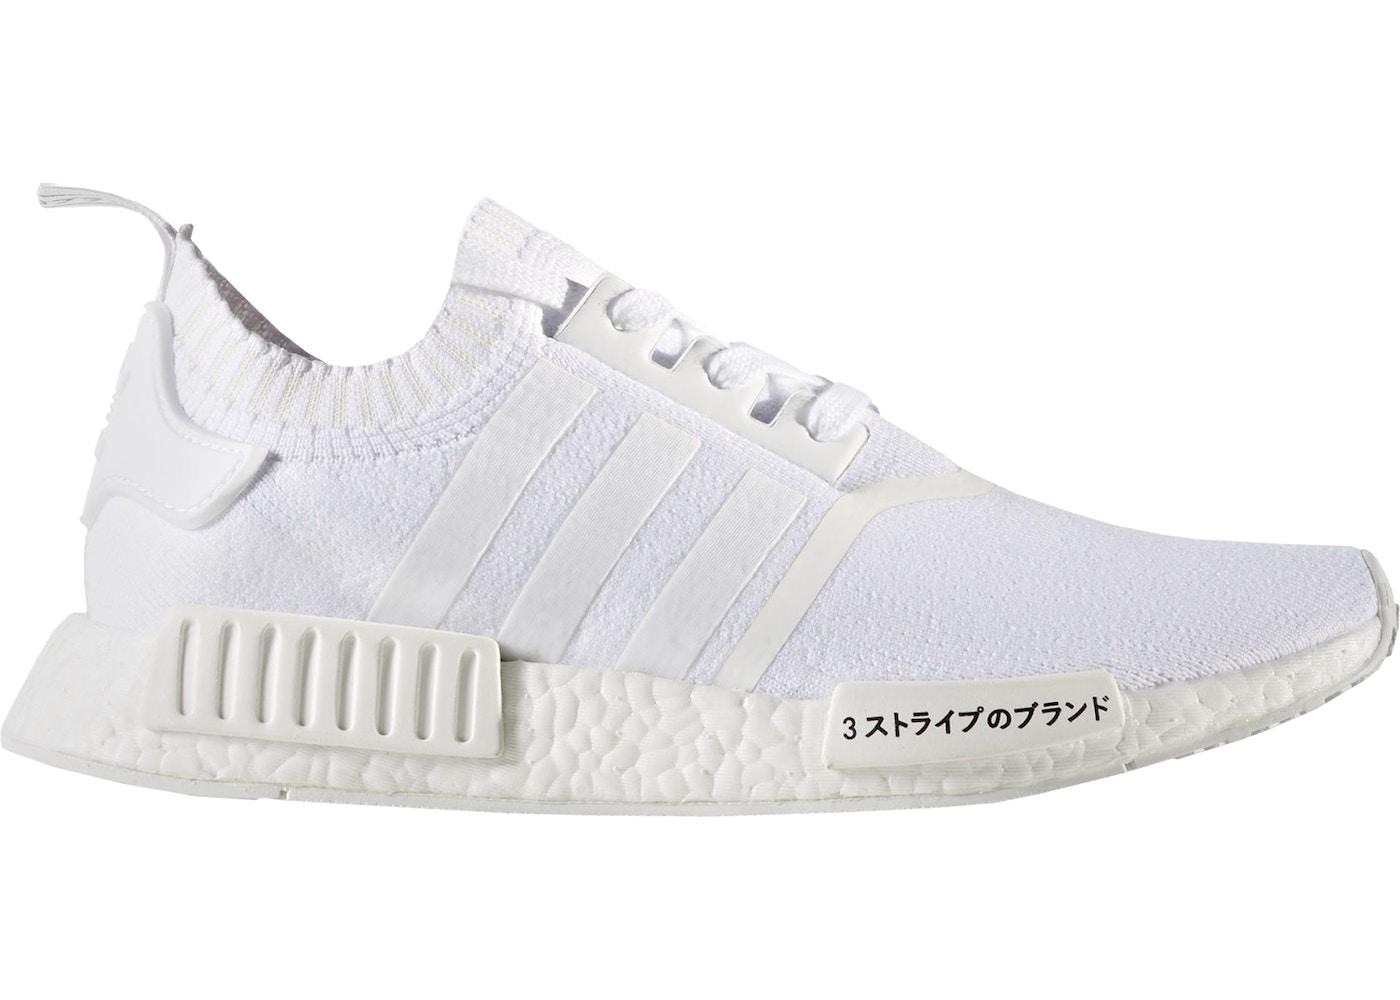 ce041293e117 ... S79166 8.5 eBay  adidas NMD R1 Japan Triple White - BZ0221 ...